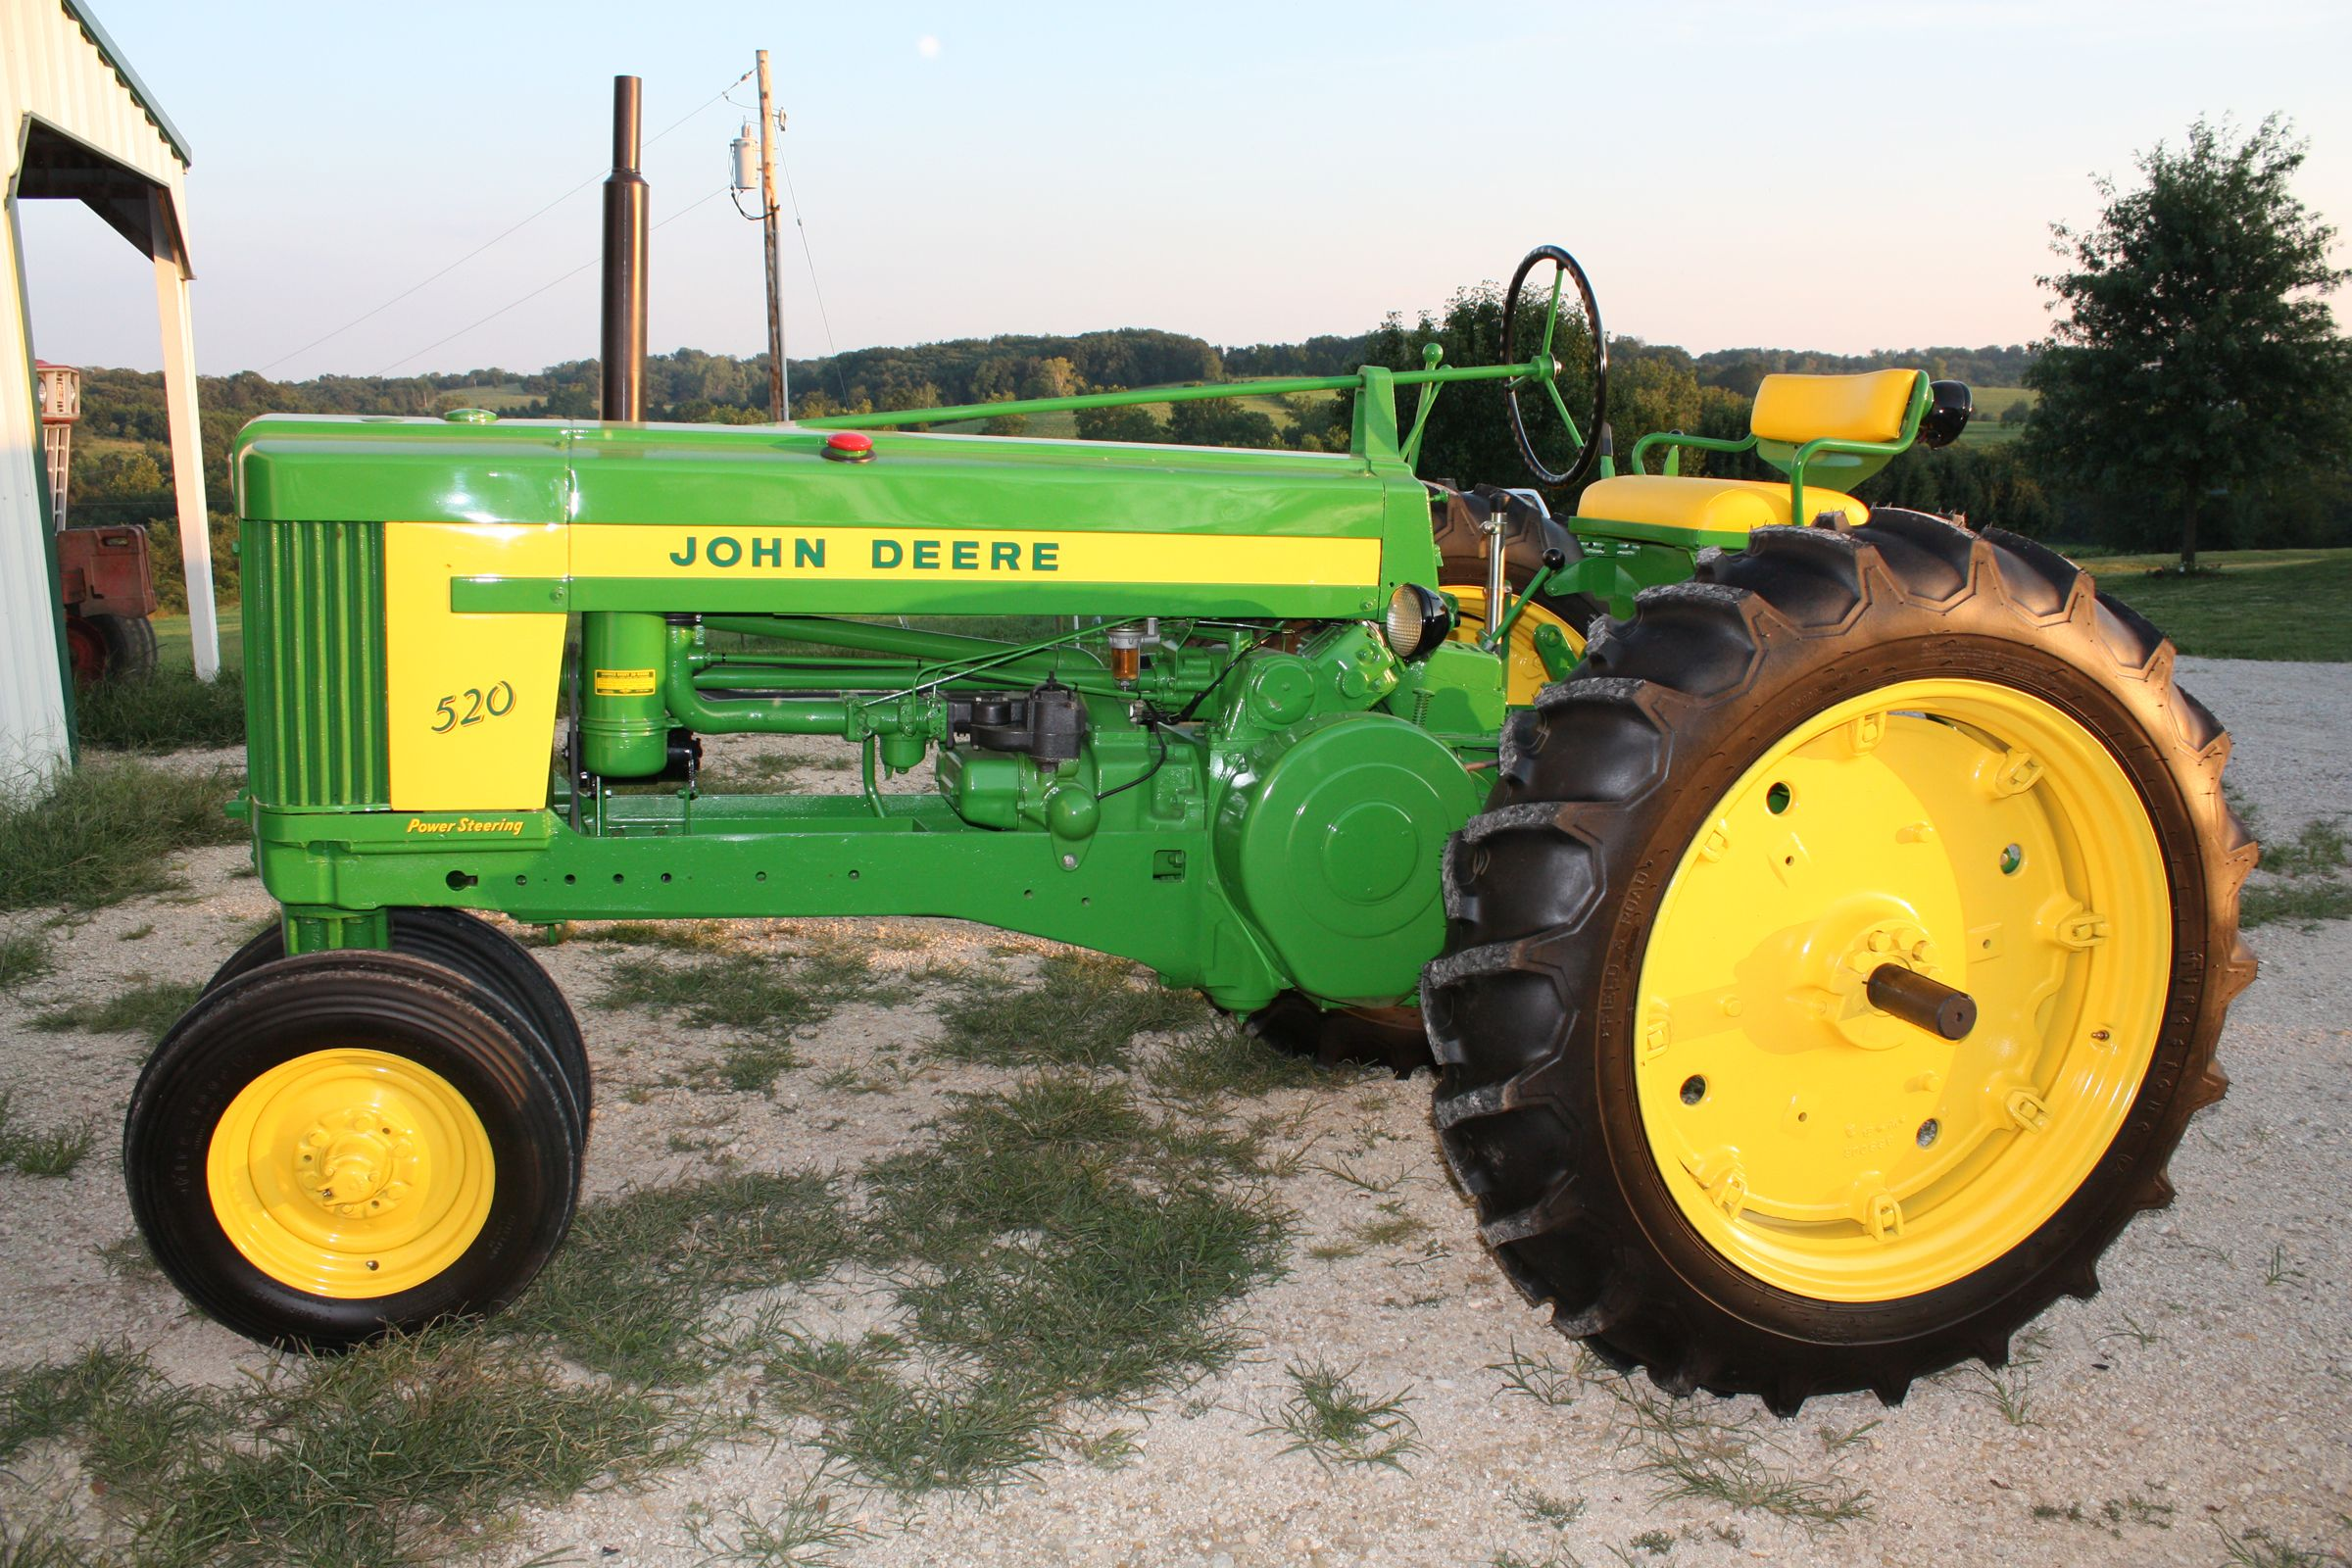 Old John Deere Tractors : Old john deere tractors antique tractor restoration